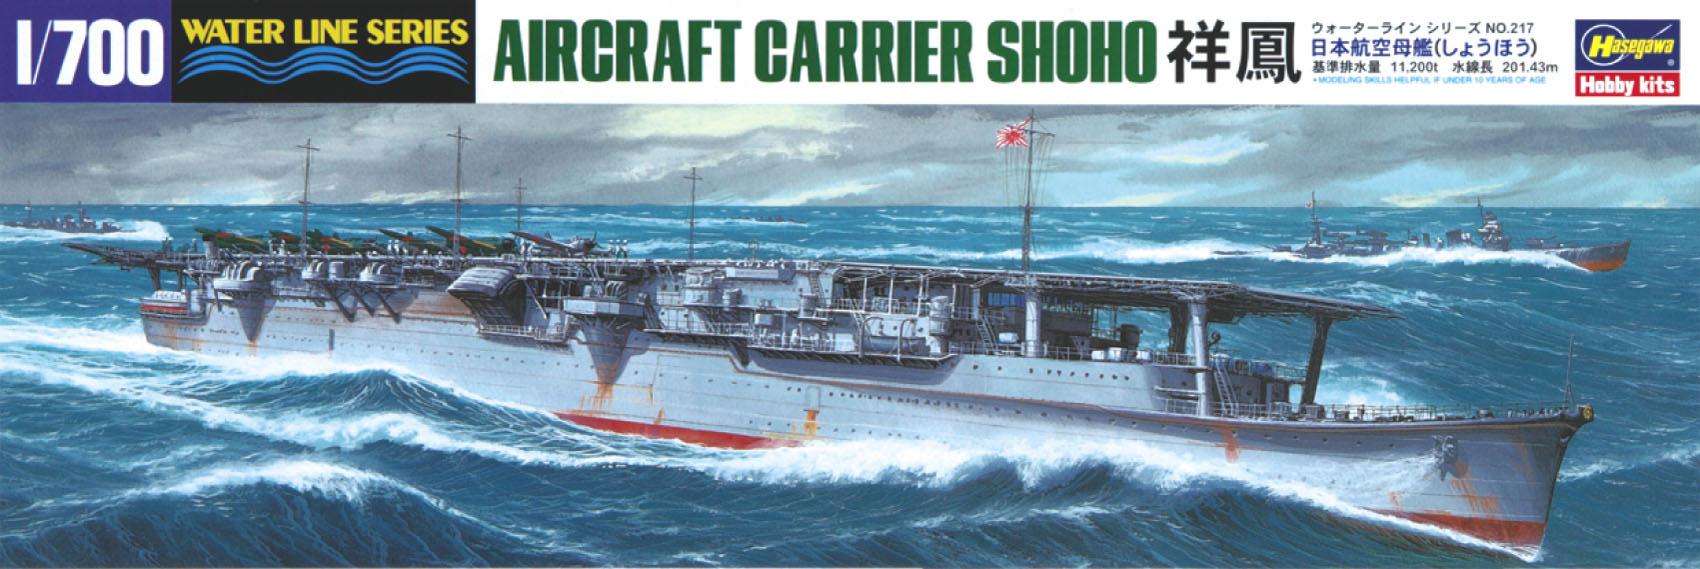 Hasegawa Aircraft Carrier Shoho